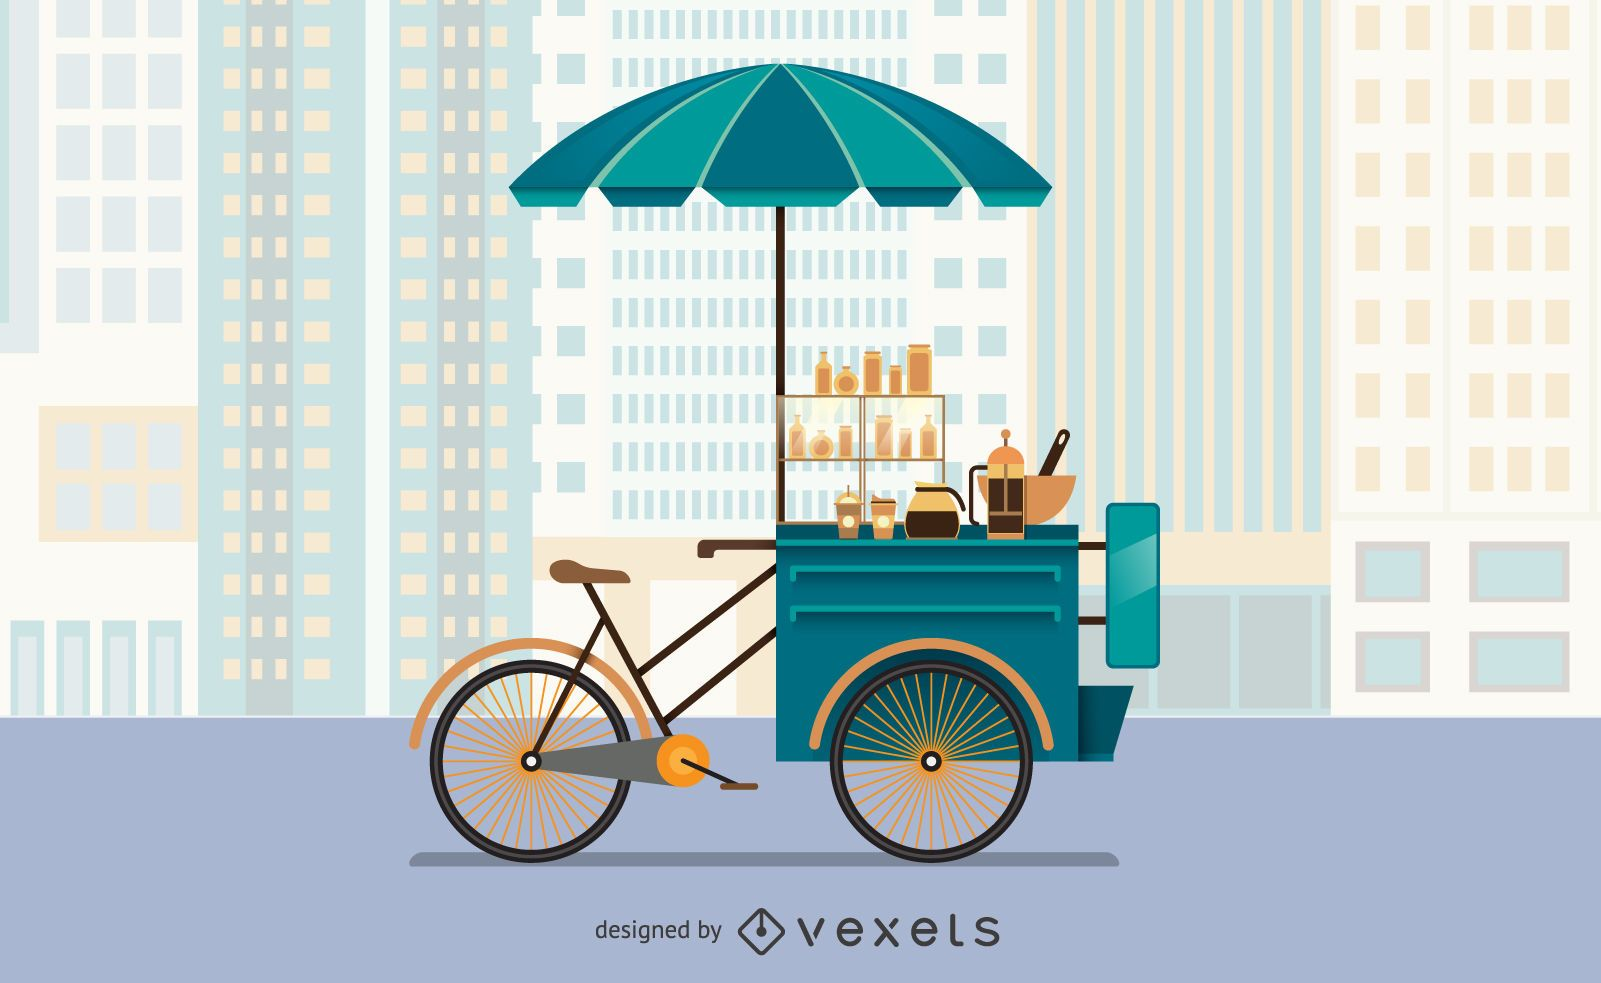 Bicycle food cart illustration